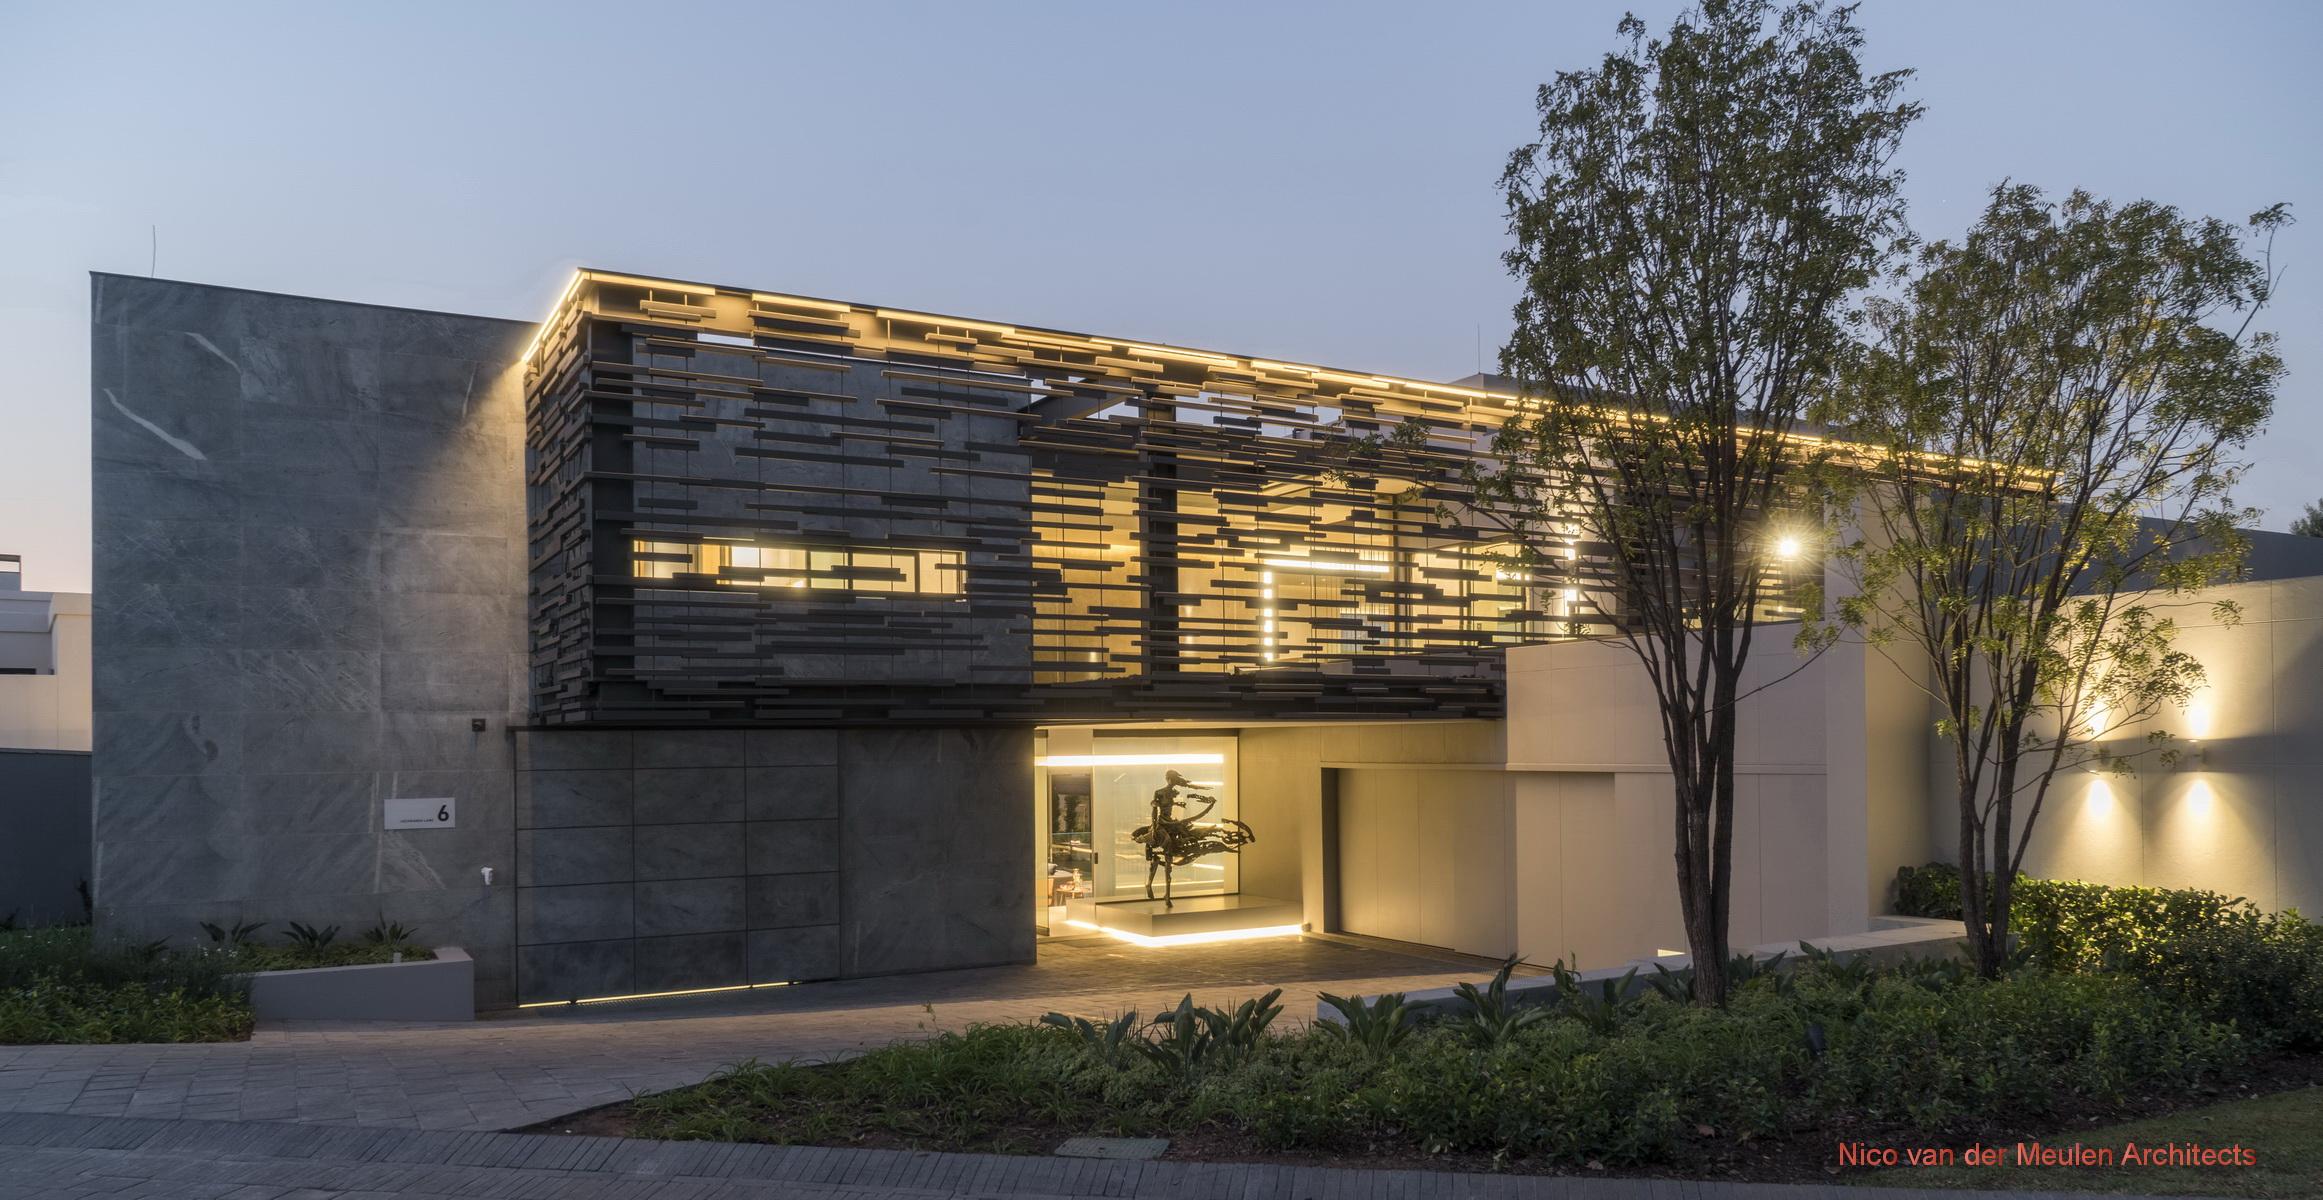 Forrest road architect magazine nico van der meulen - Commercial van interiors locations ...